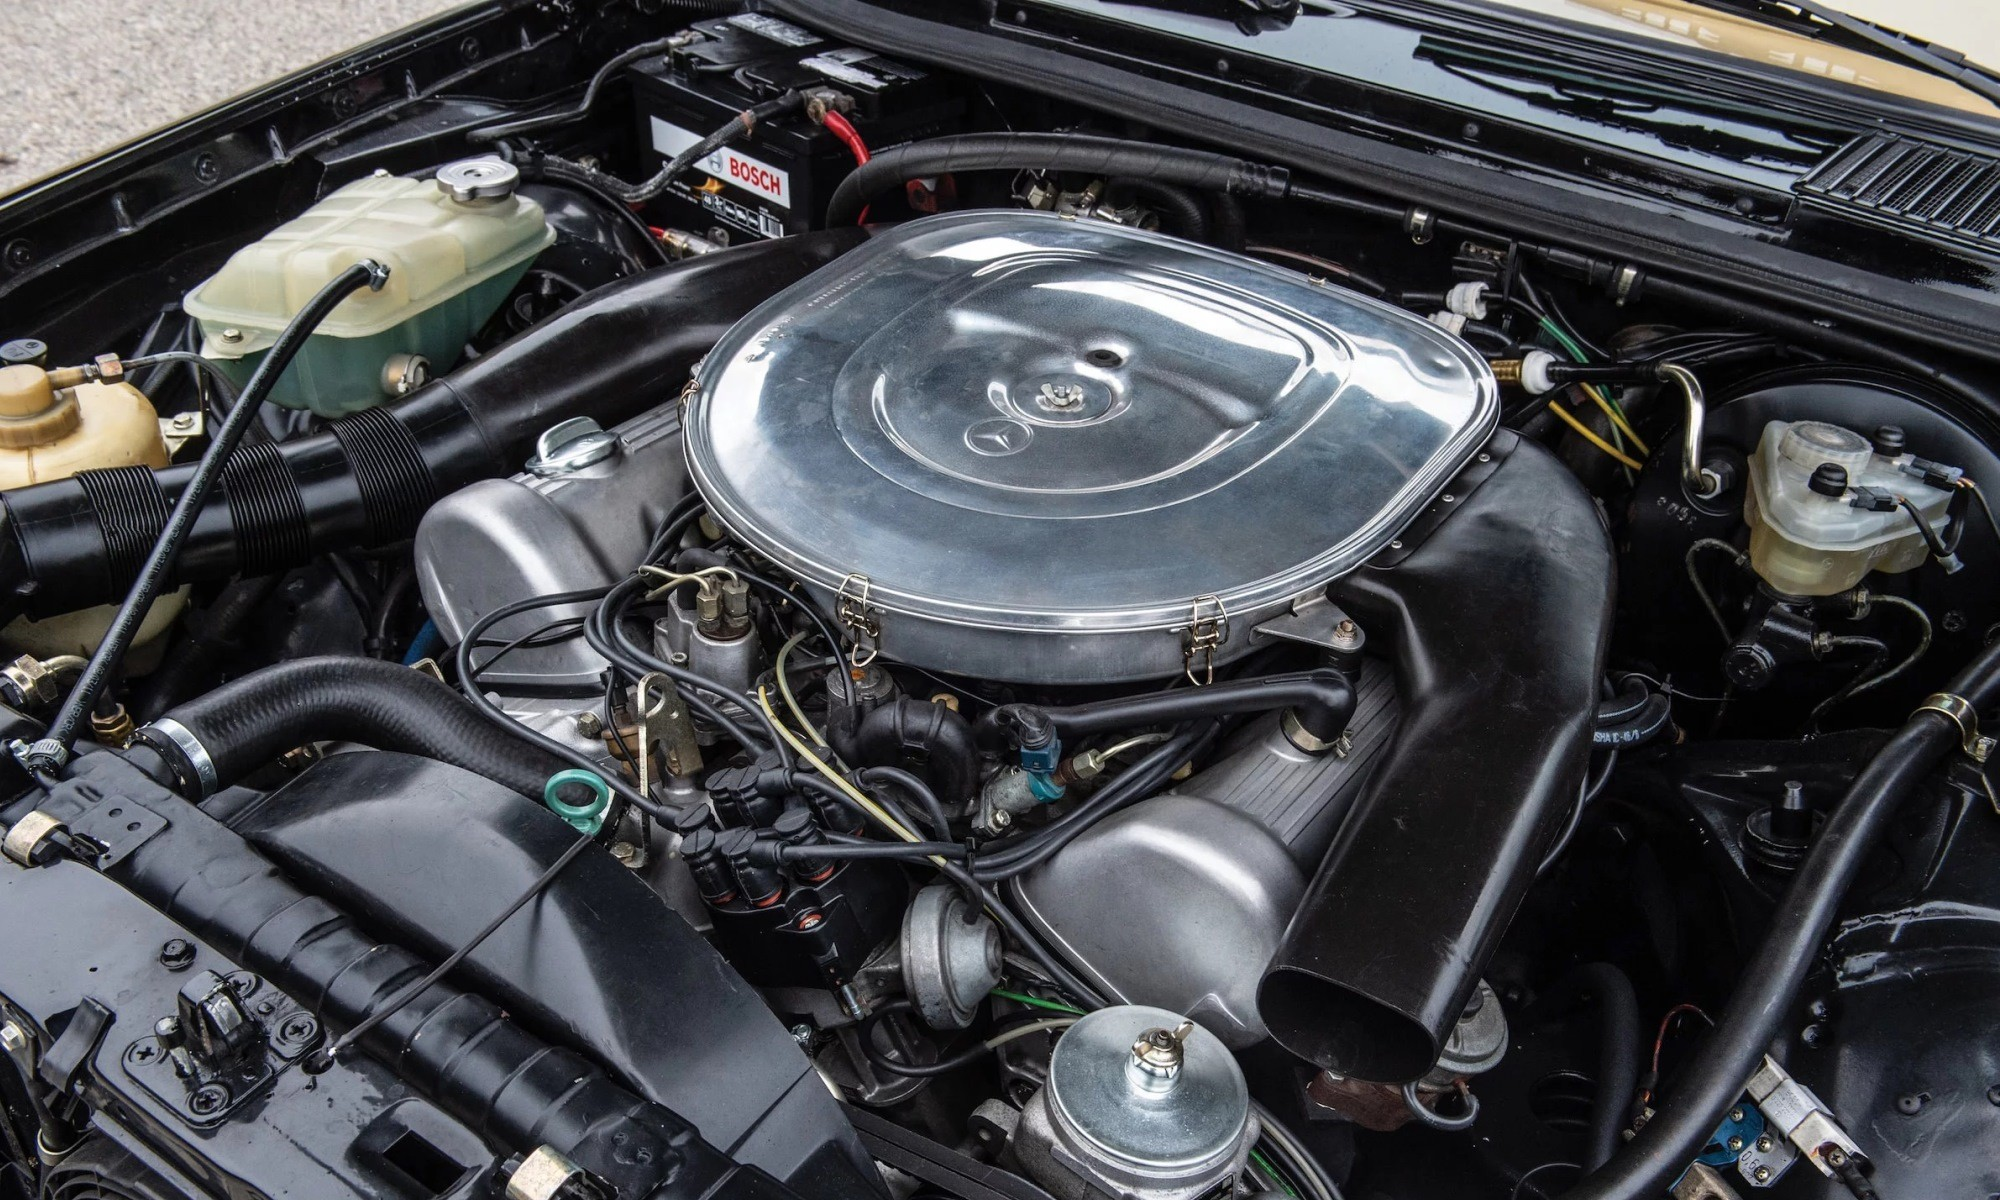 V8-powered Mercedes-Benz 500TE AMG engine